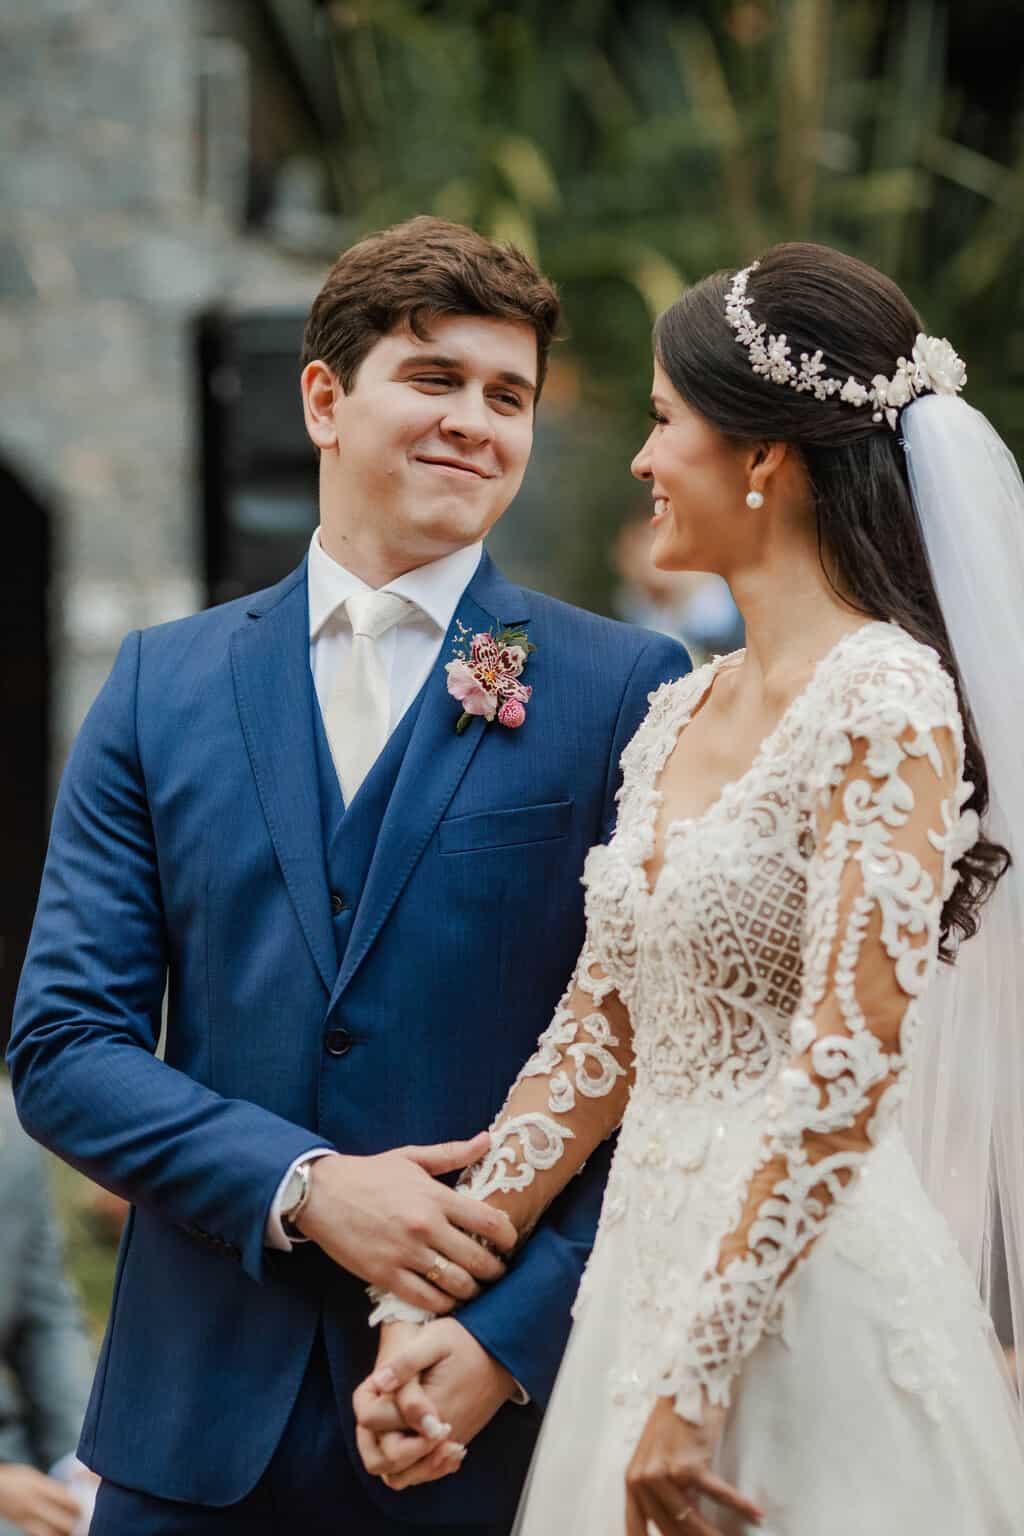 casamento-Beatriz-e-Joao-Fernando-cerimonia-ao-ar-livre-Itaipava-Locanda-Della-Mimosa-Thienny-Tammis139